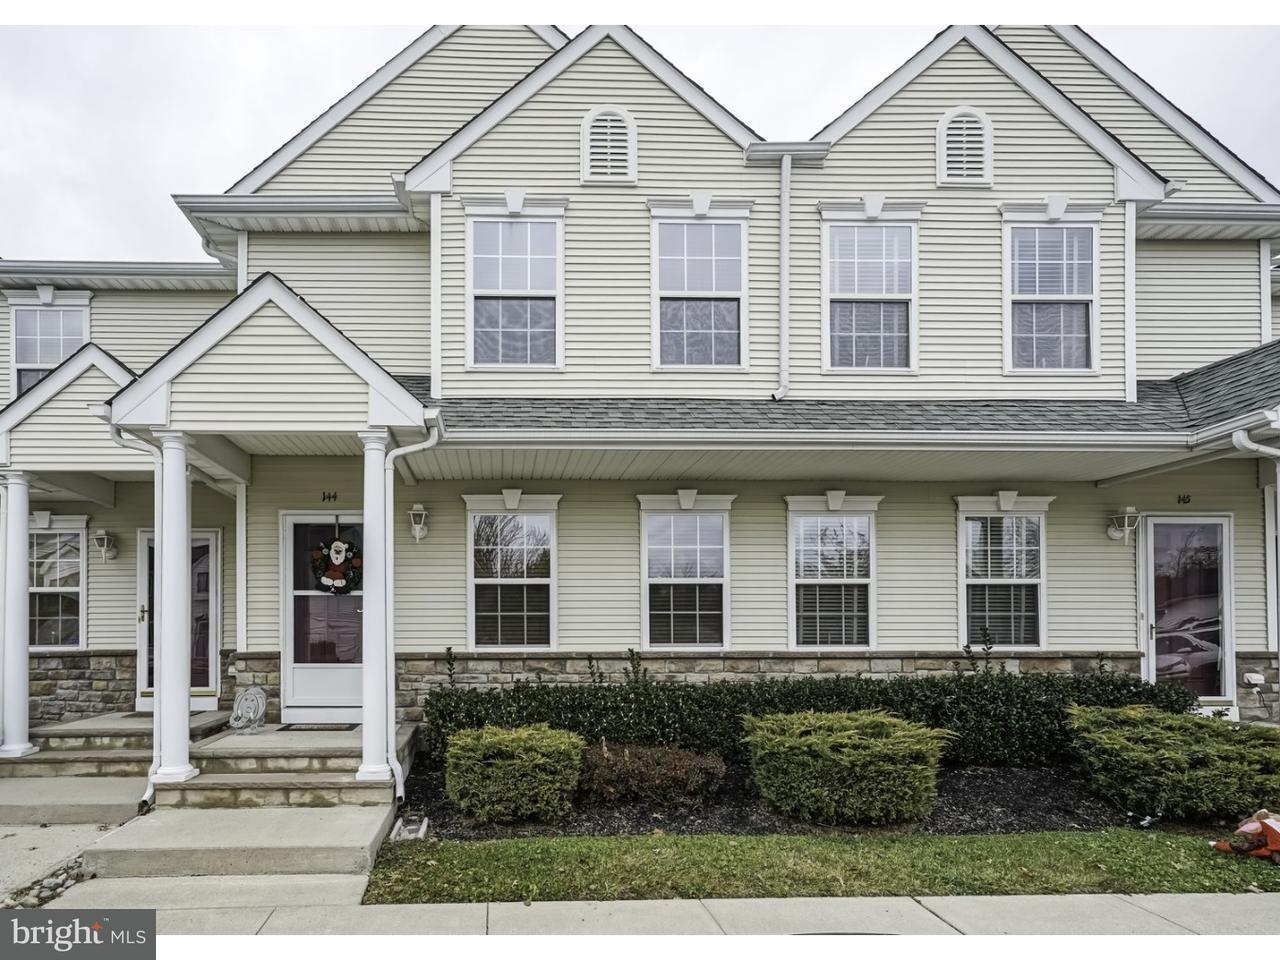 Townhouse for Rent at 144 YORKTOWN BLVD Hammonton, New Jersey 08037 United States